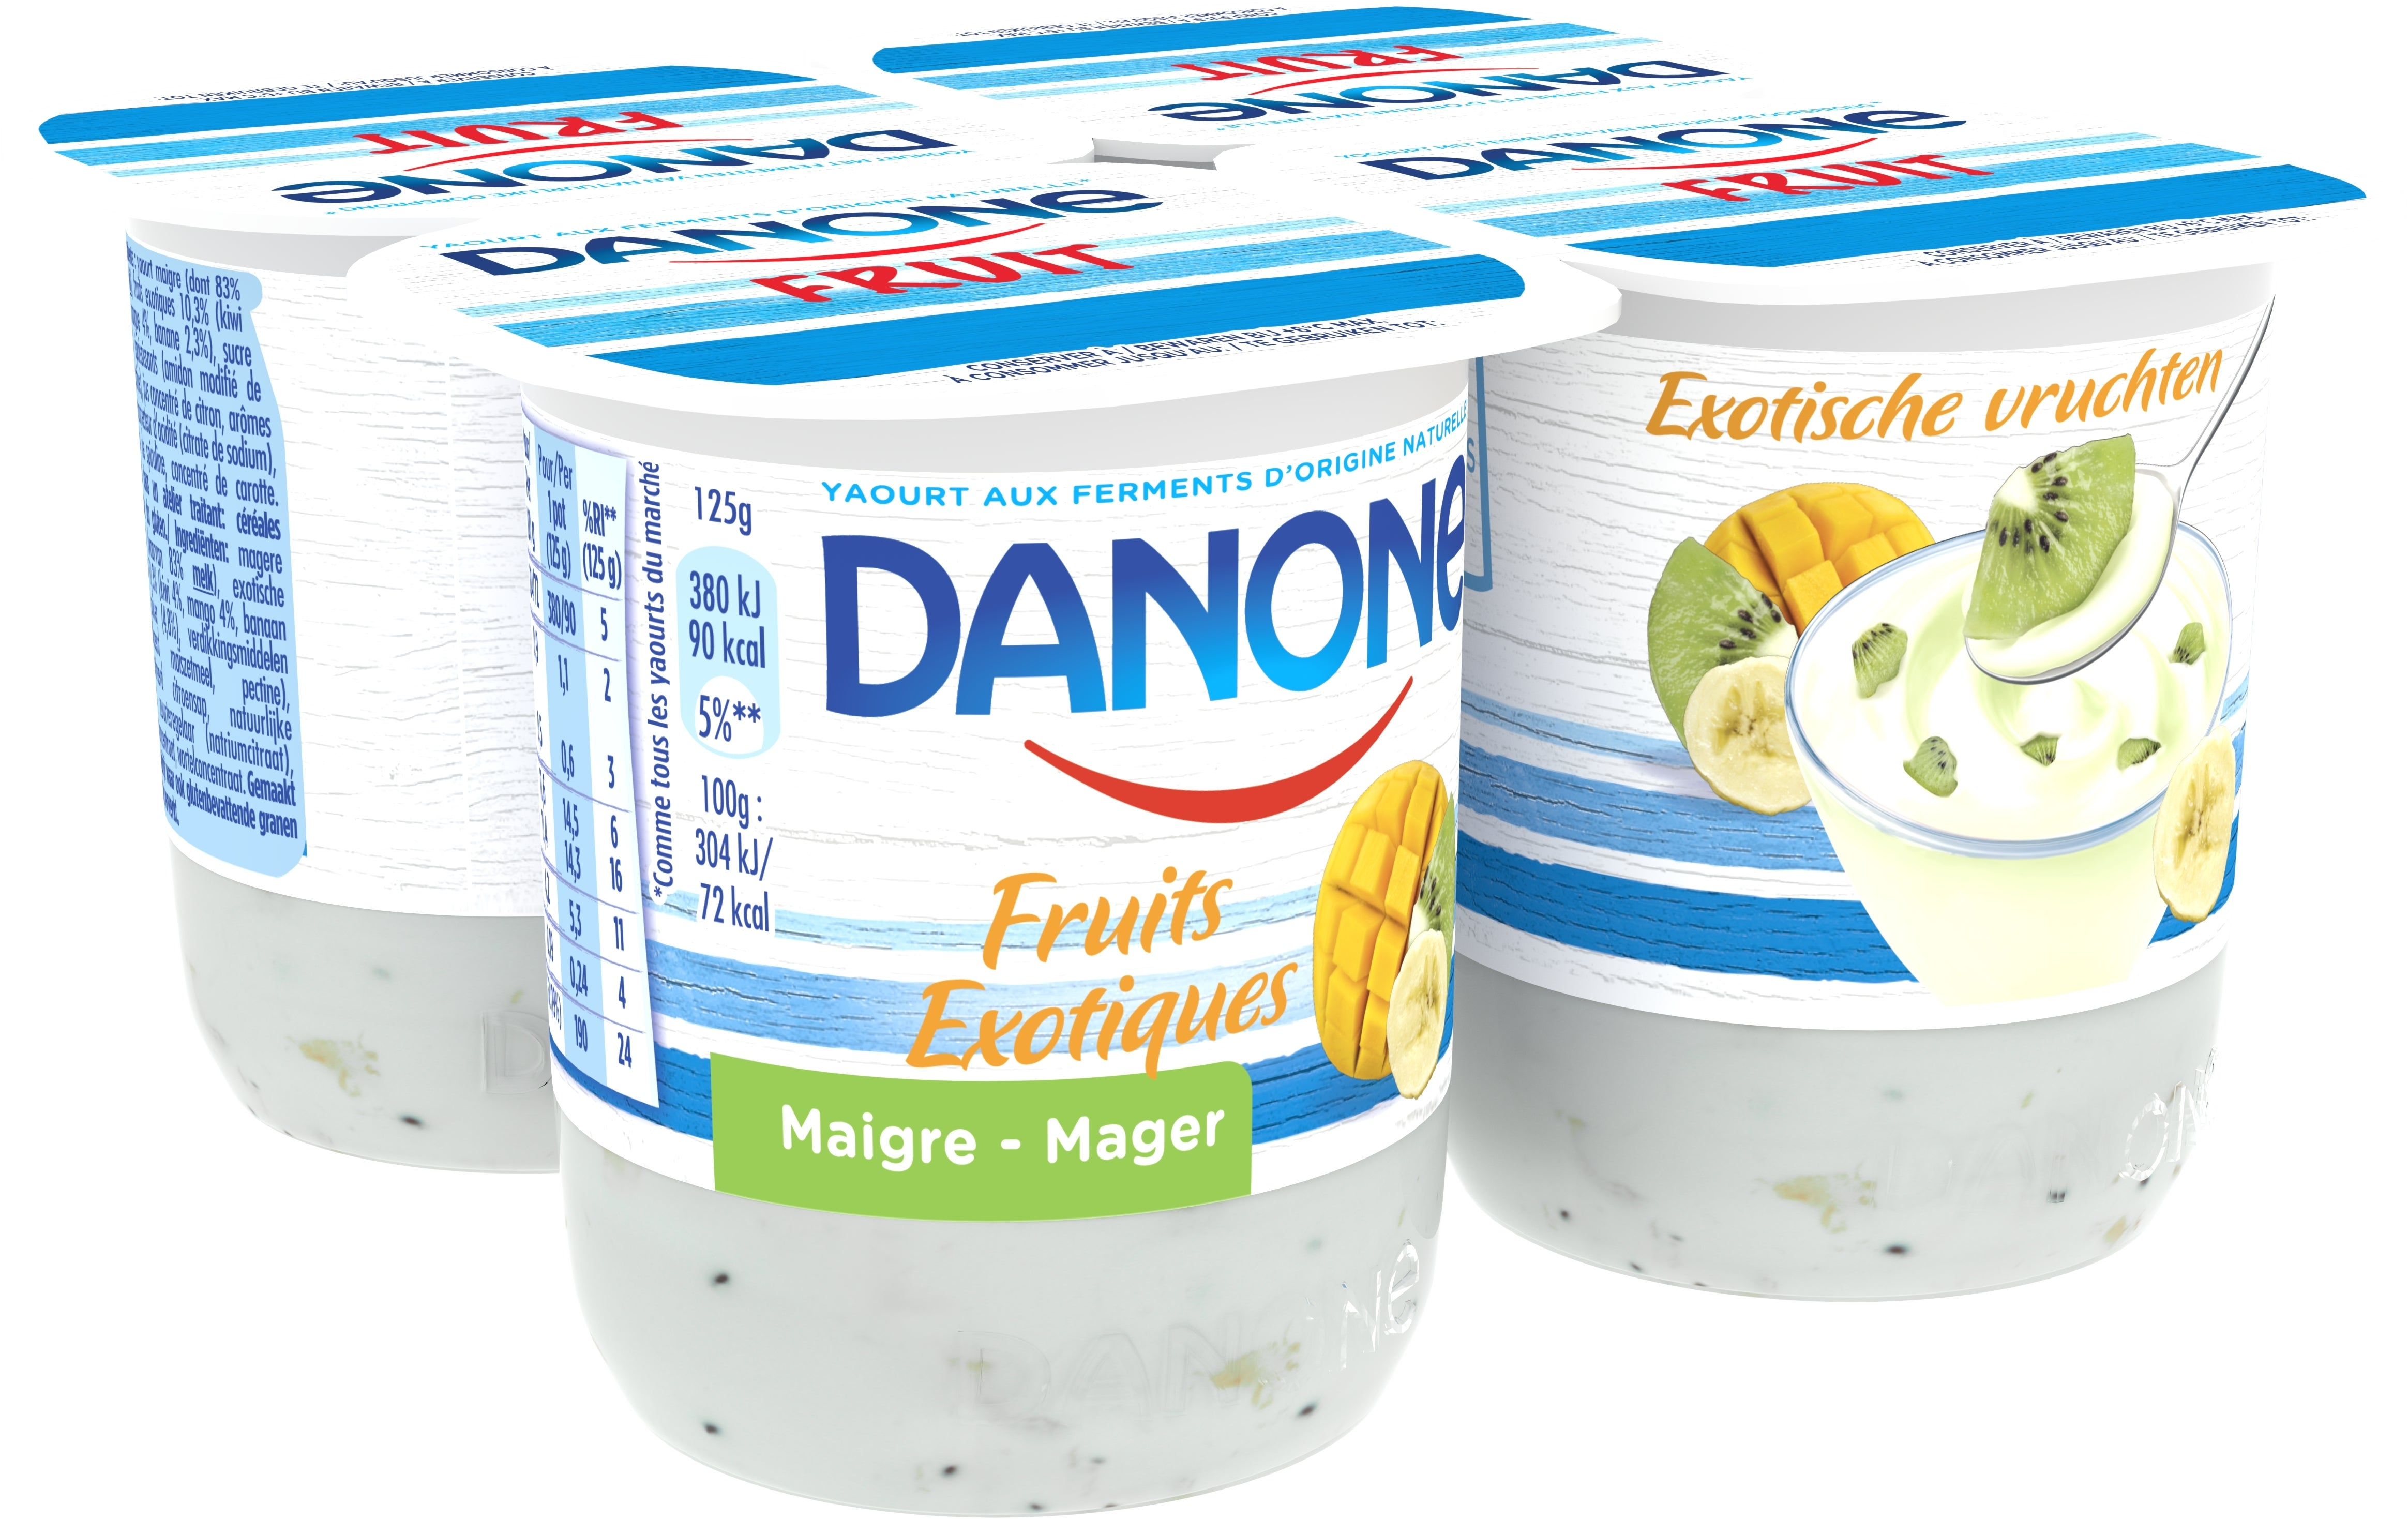 Danone Yaourts maigre 4x125gr aux fruits exotiques